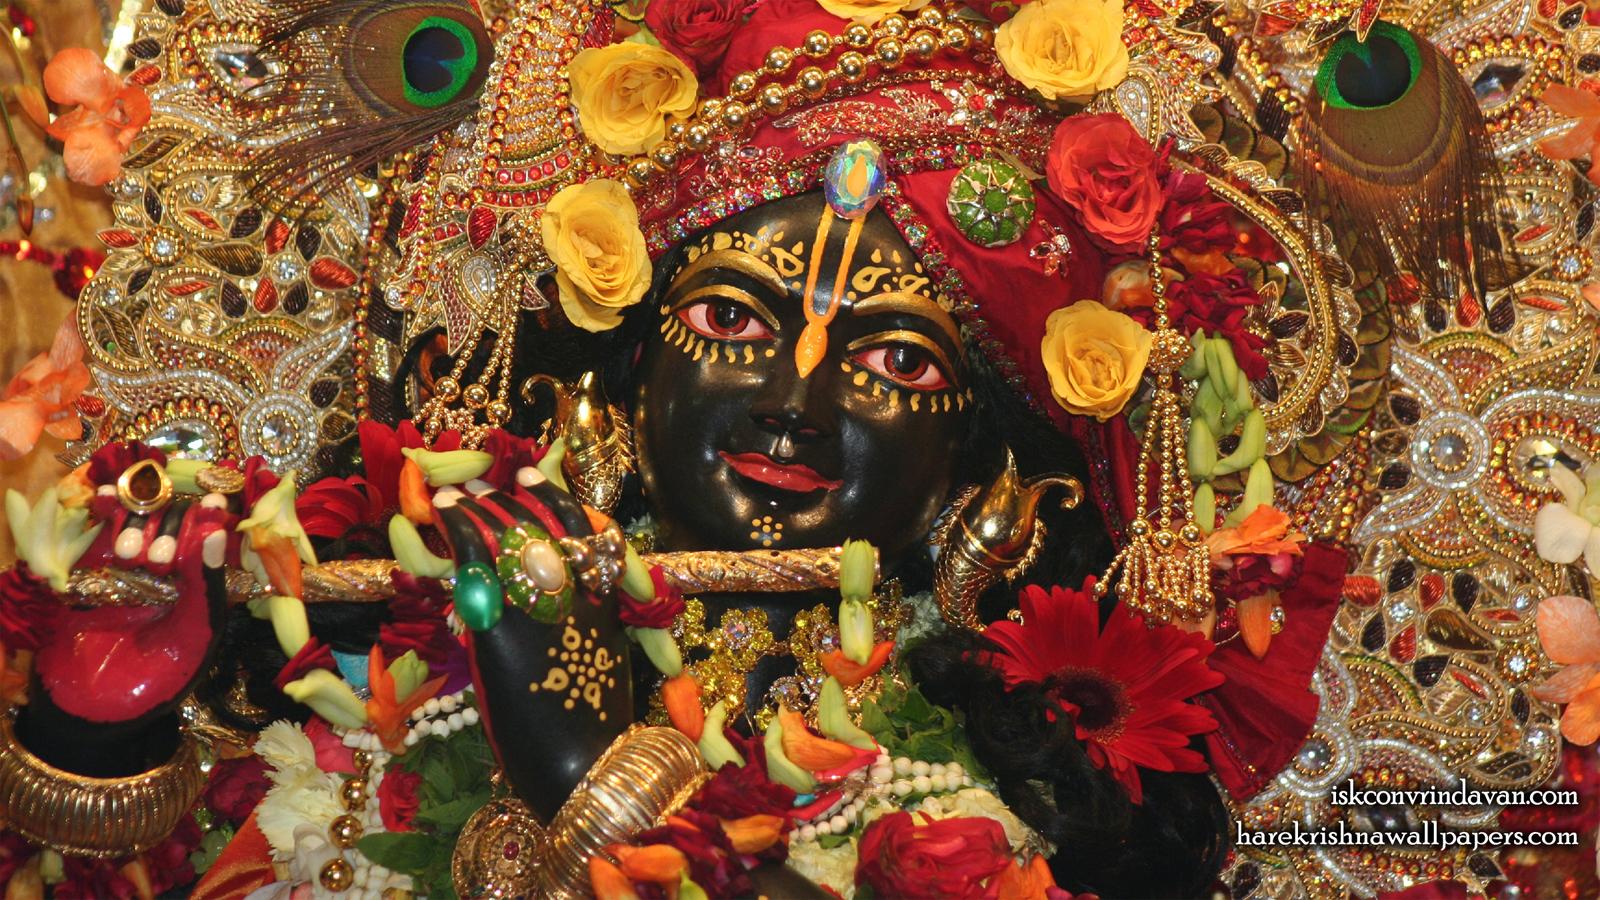 Sri Shyamsundar Close up Wallpaper (012) Size 1600x900 Download